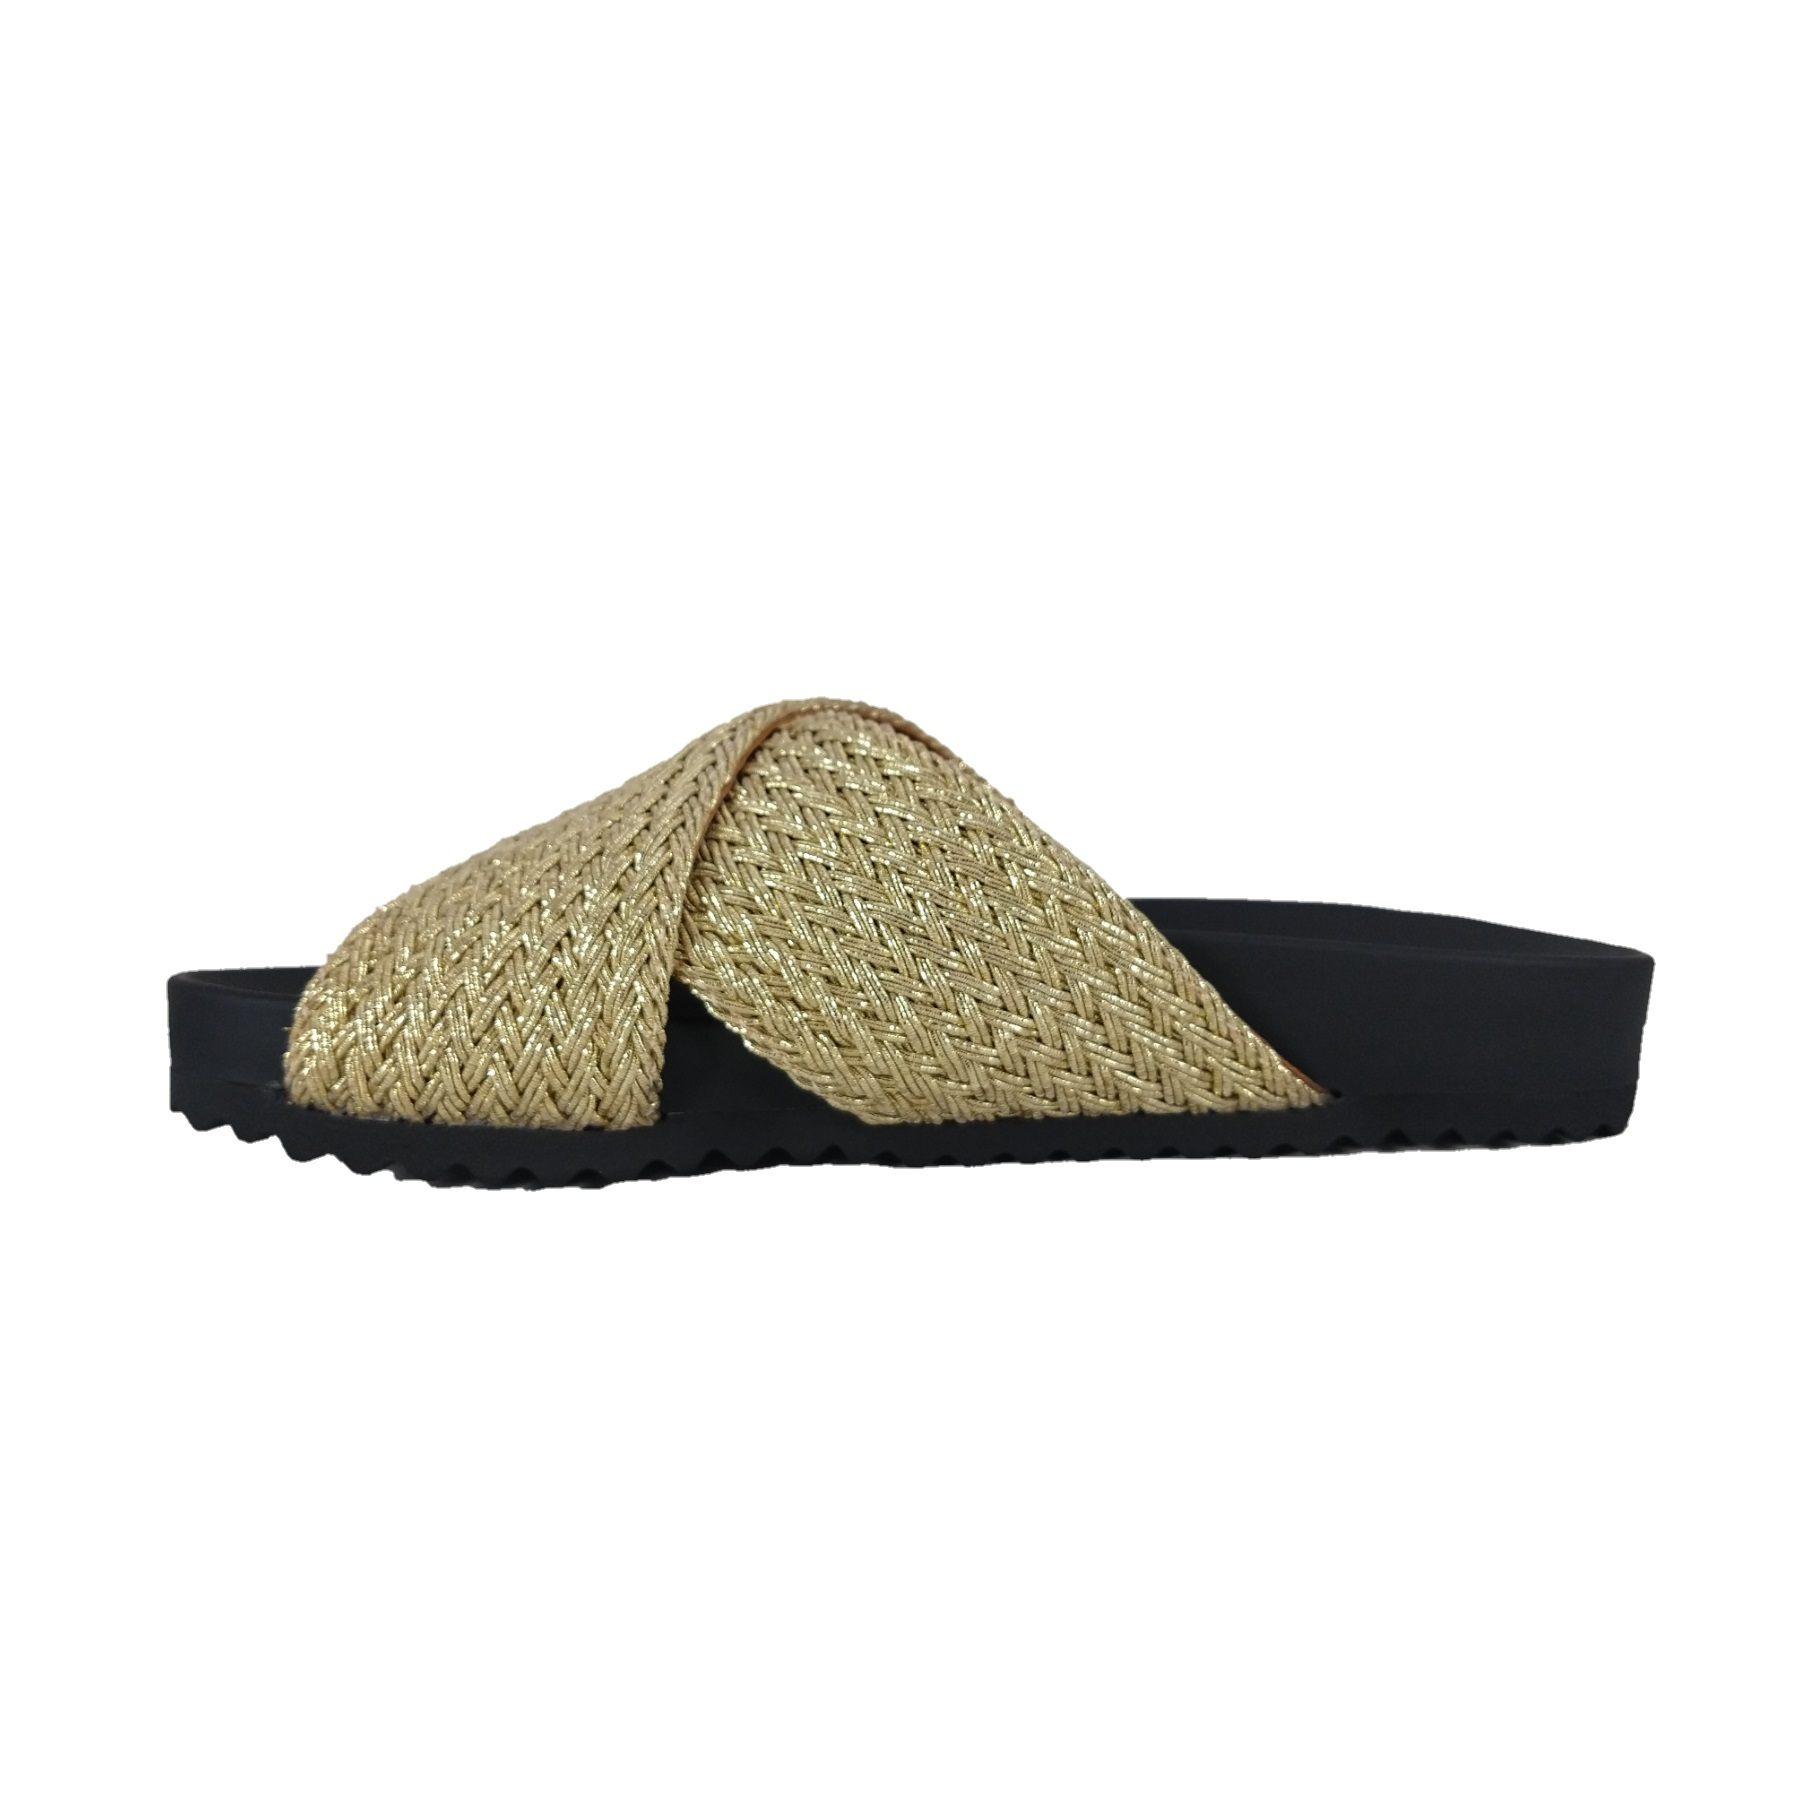 Chinelo Tiras SapatoWeb Tranças Ouro  - SAPATOWEB.COM